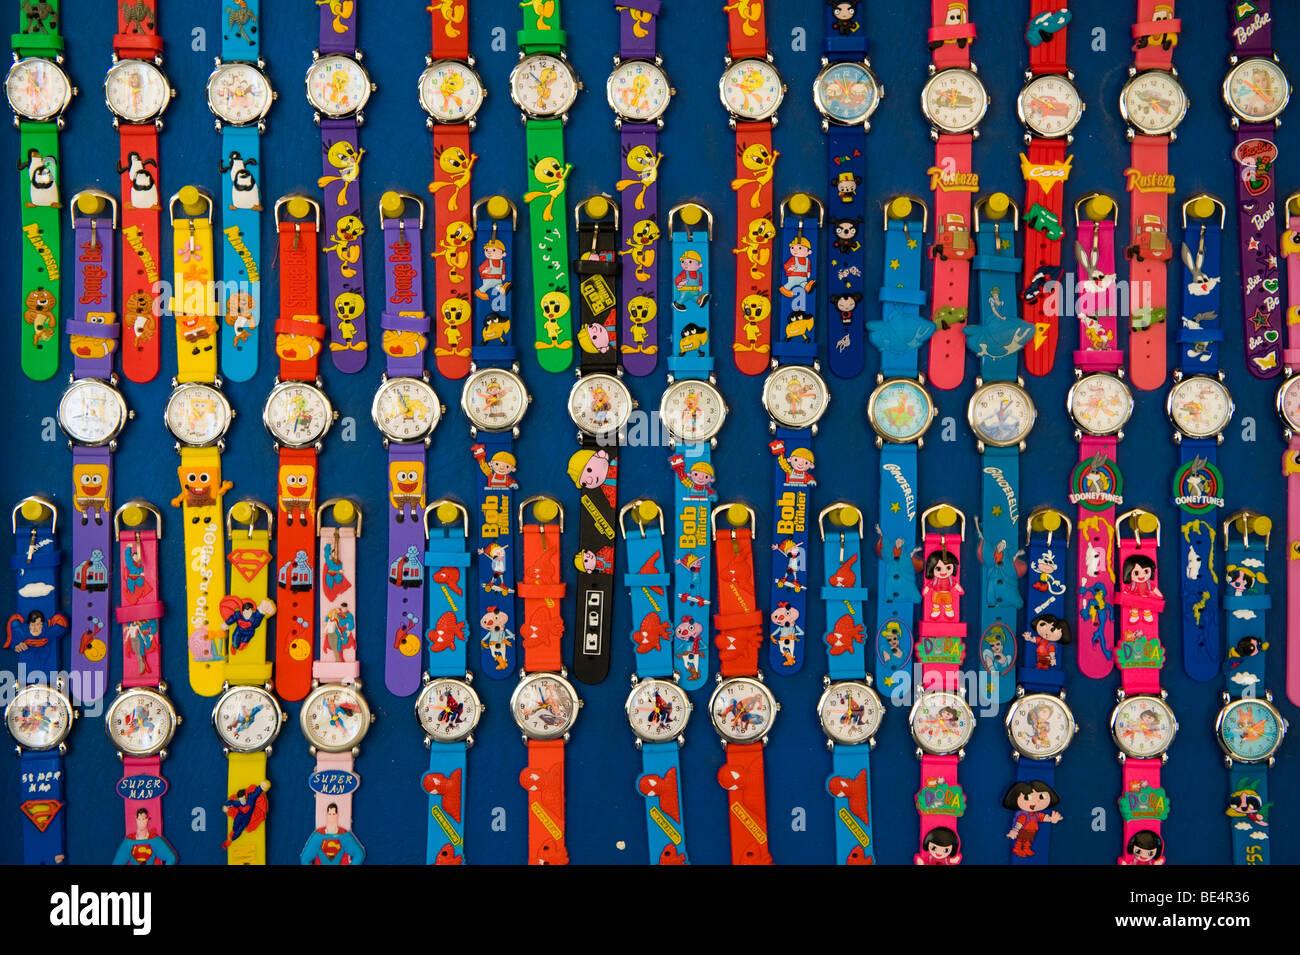 Bild von Cartoon Charakter Armbanduhren auf dem display Stockbild